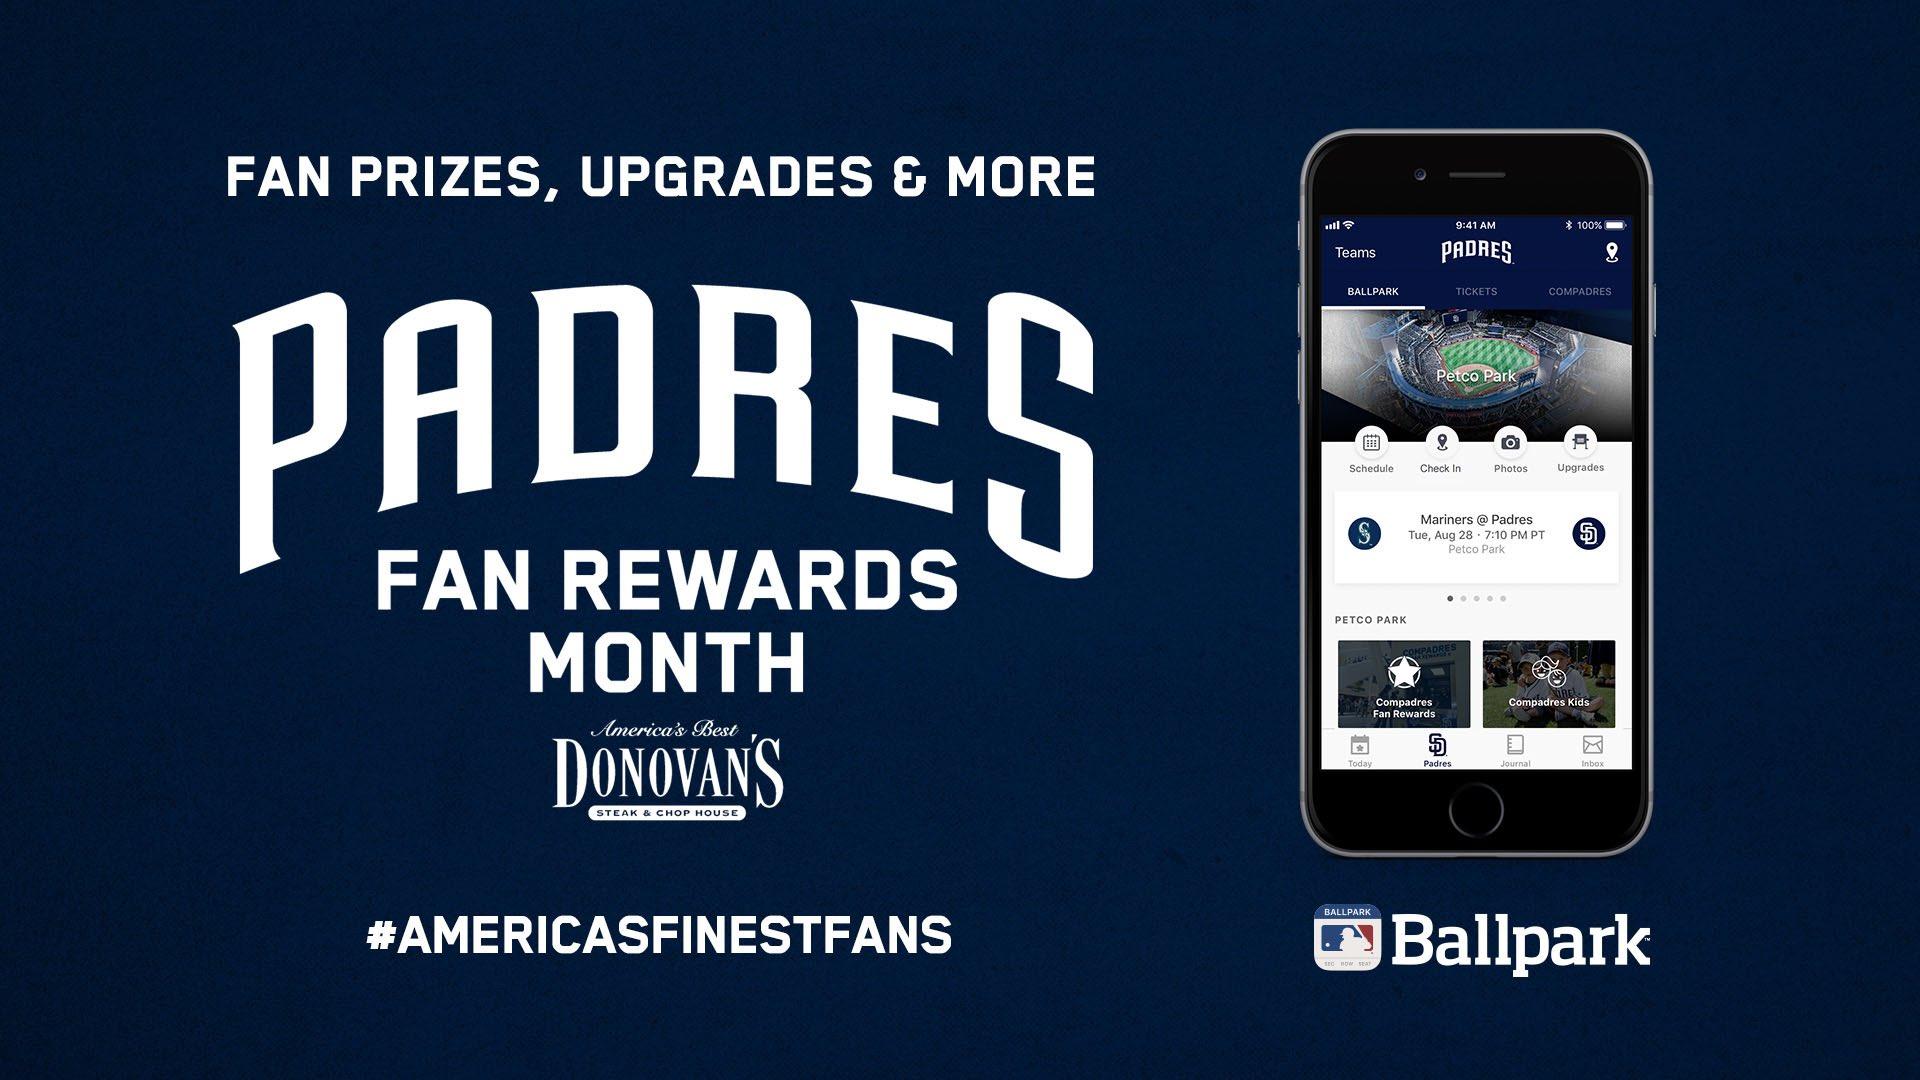 San Diego Padres On Twitter We Re Celebrating